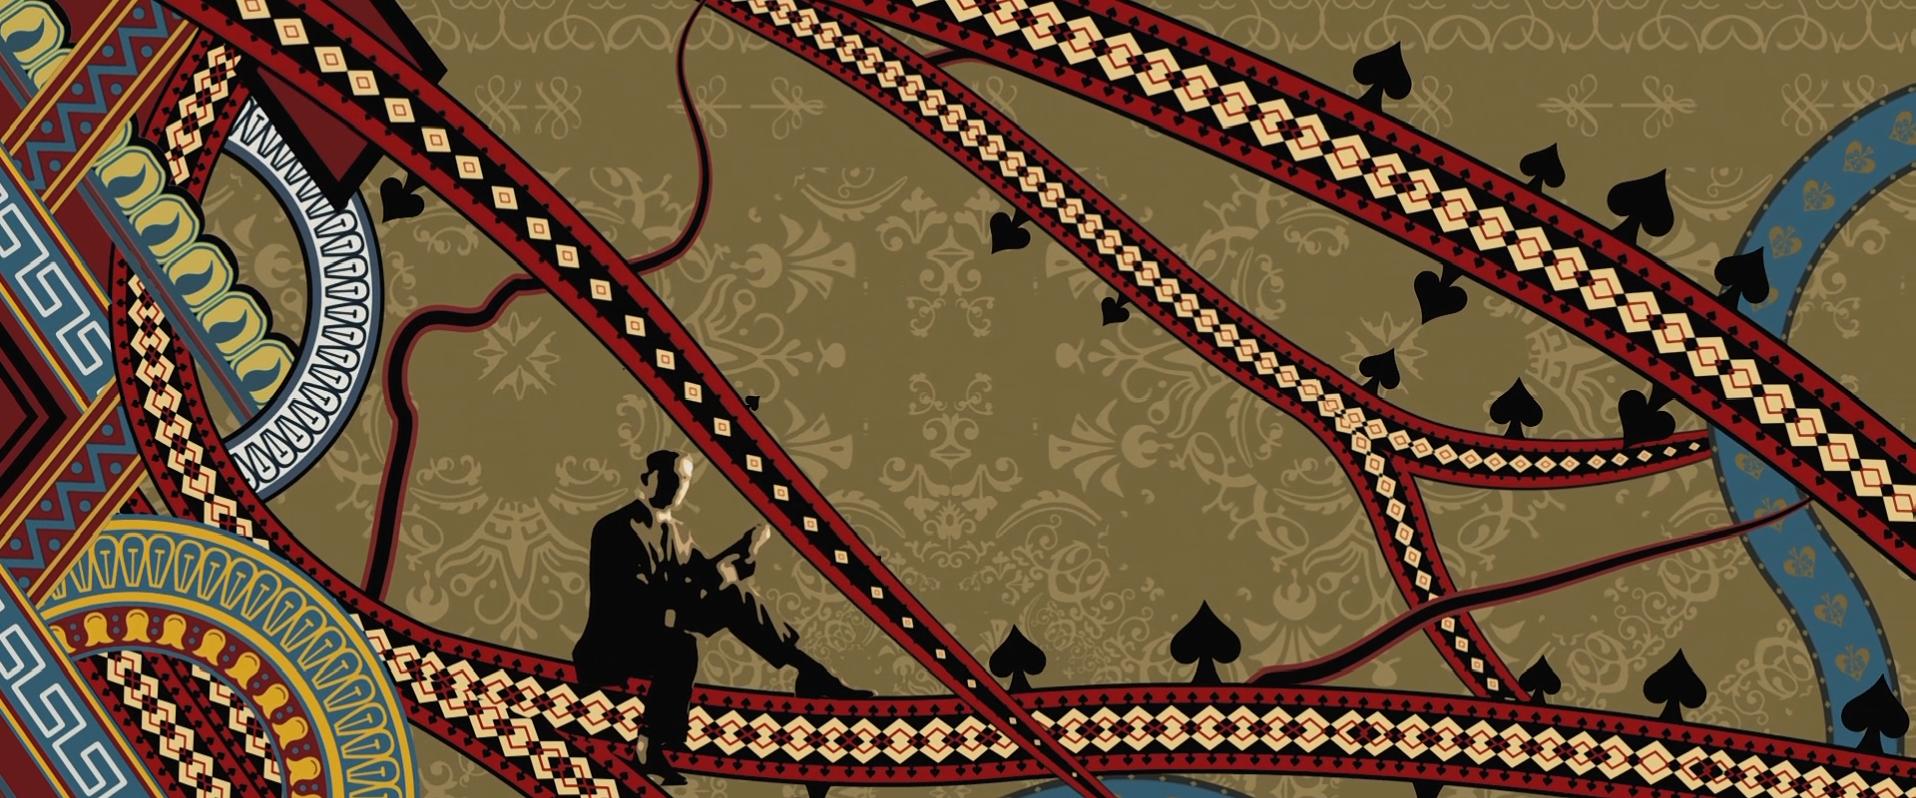 Casino royale opening casino knokke